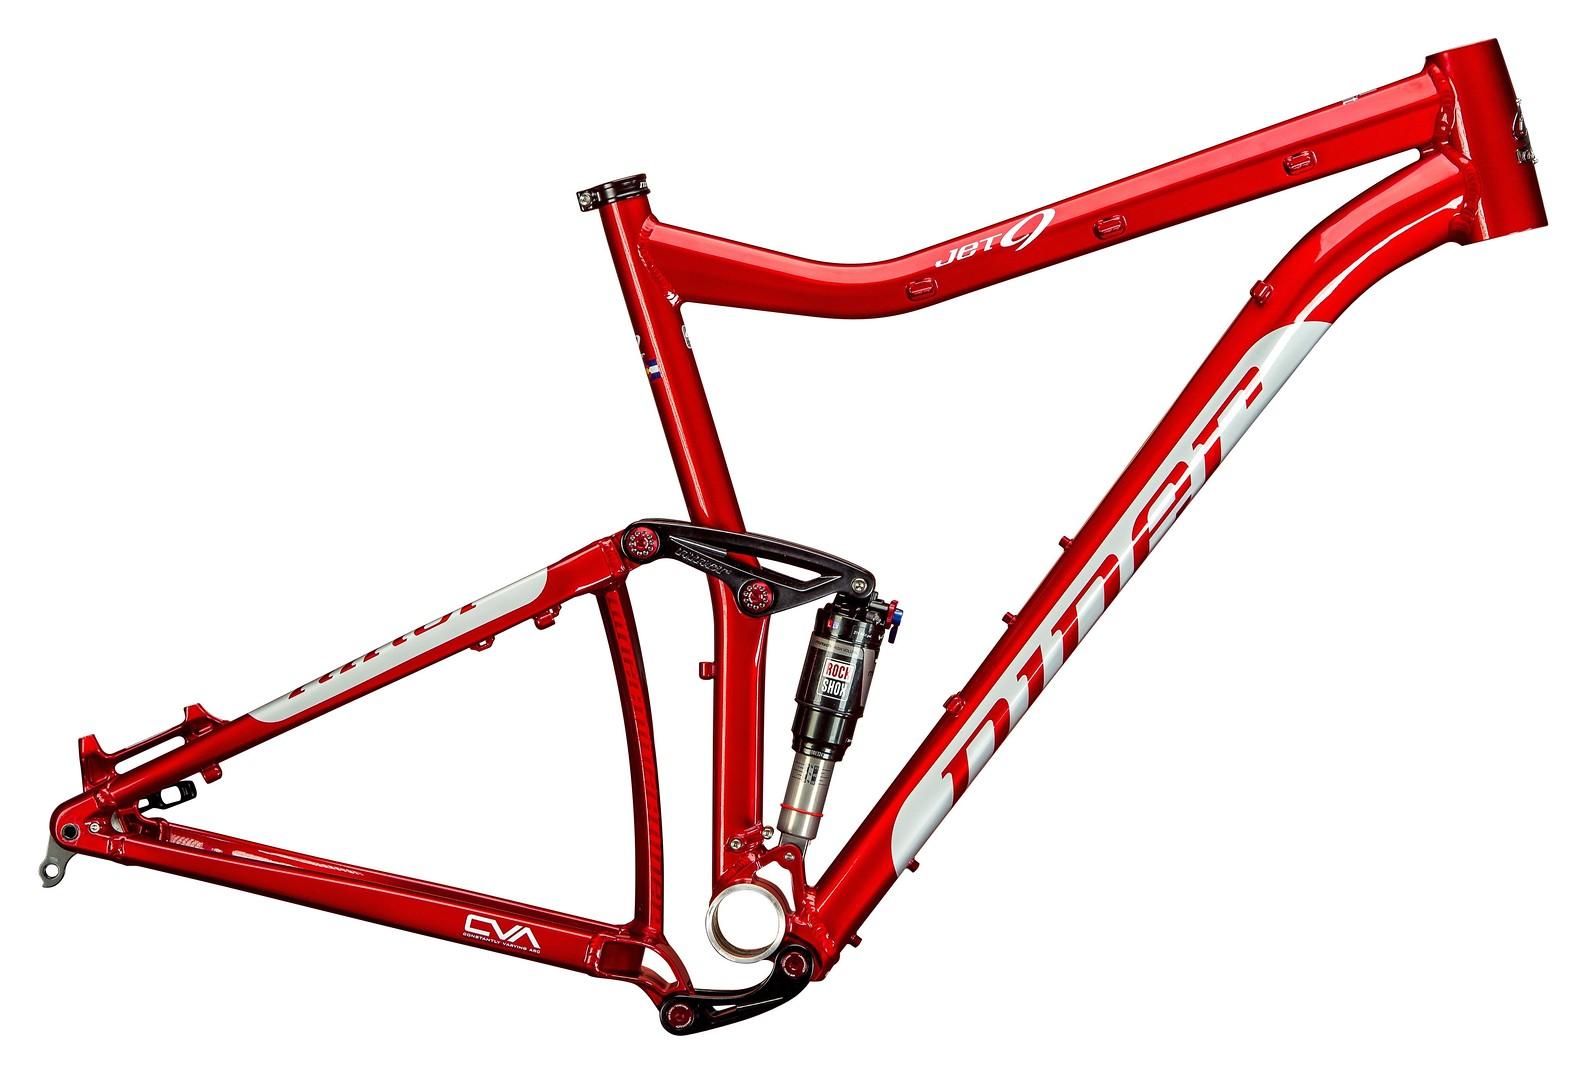 Niner JET 9 Frame - Reviews, Comparisons, Specs - Mountain Bike ...